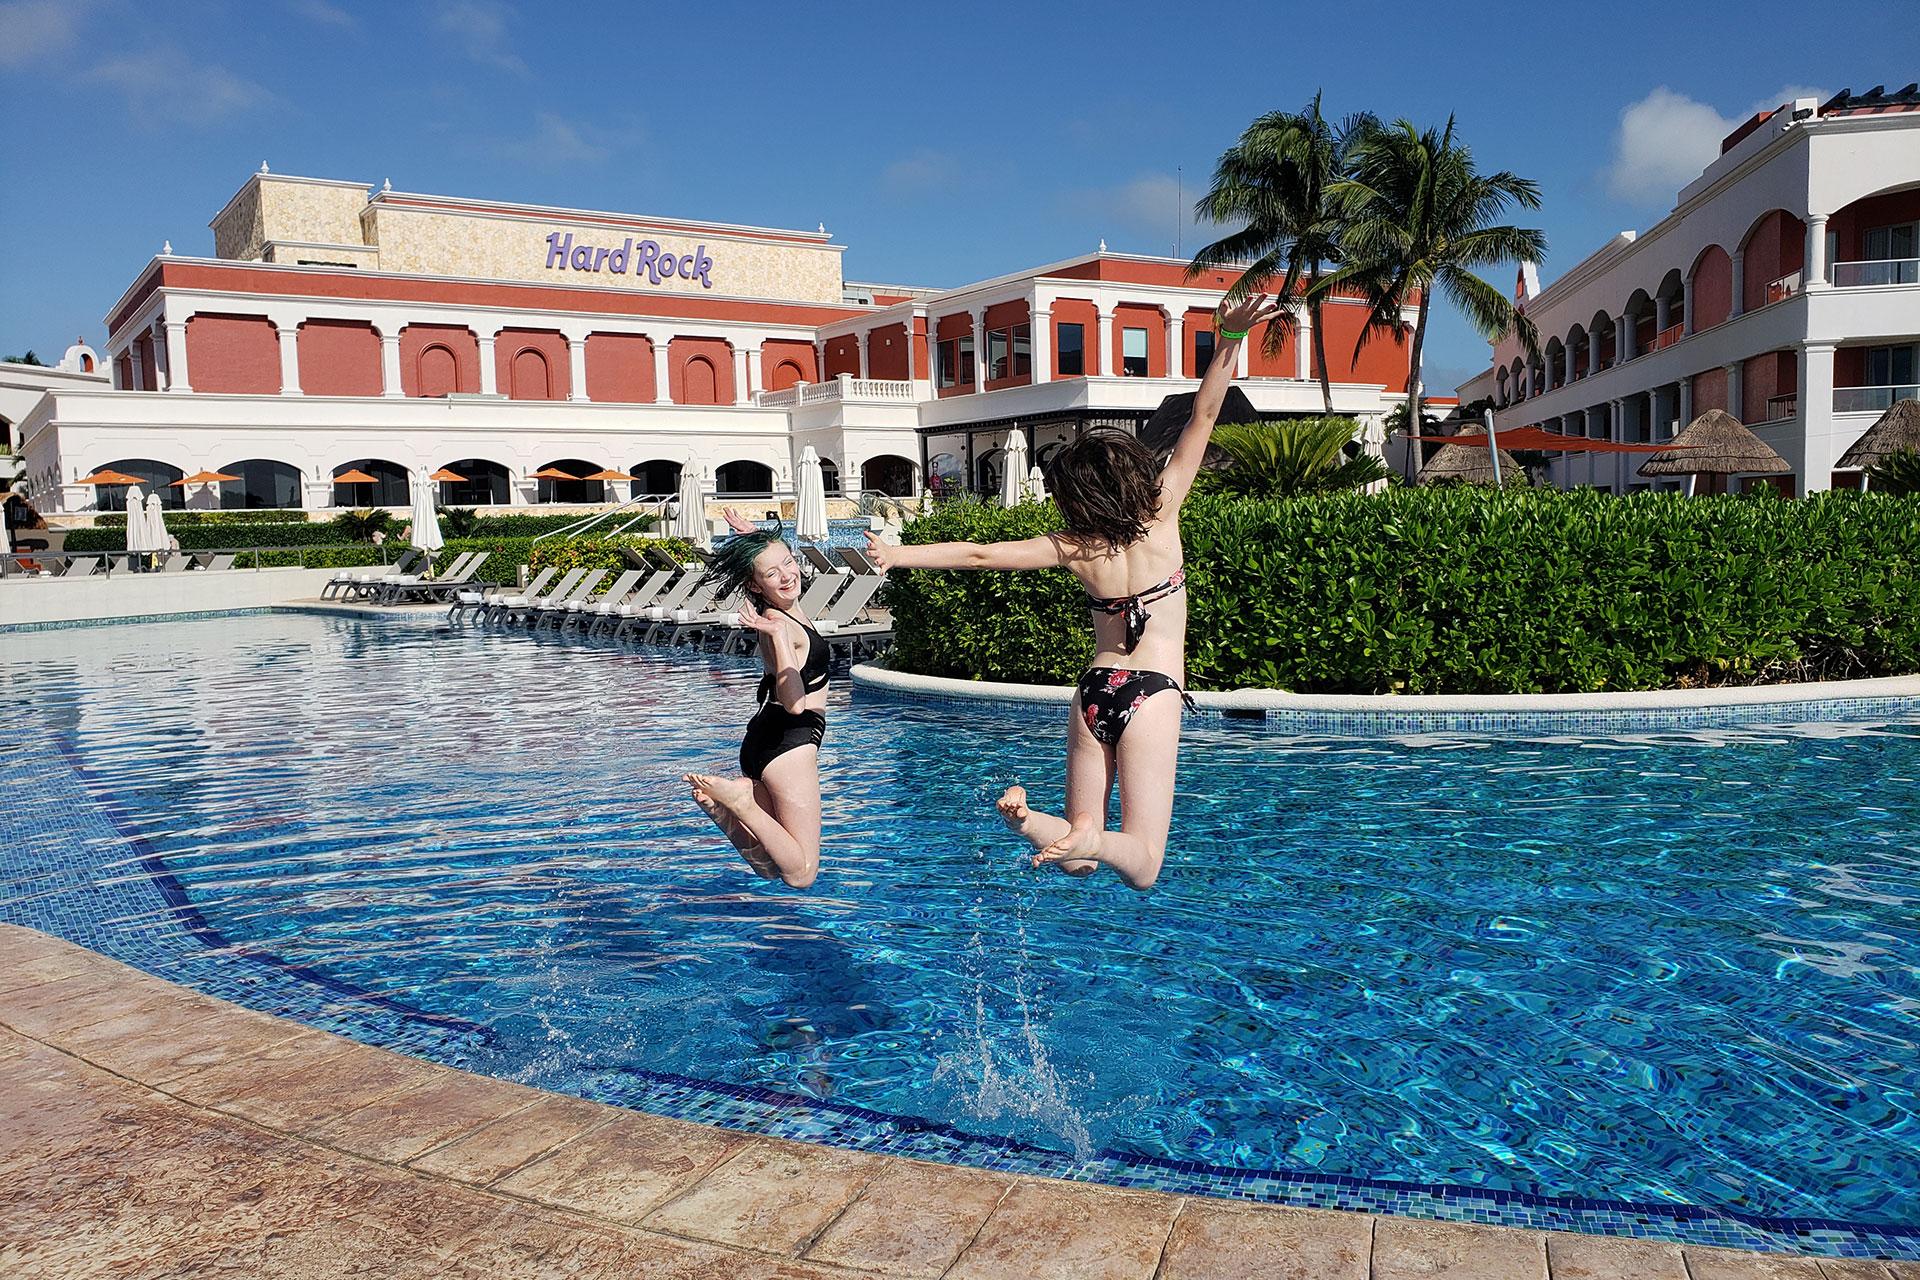 Two Teen Girls Jumping in Pool at Harck Rock Riviera Maya; Courtesy of Jeff Bogle